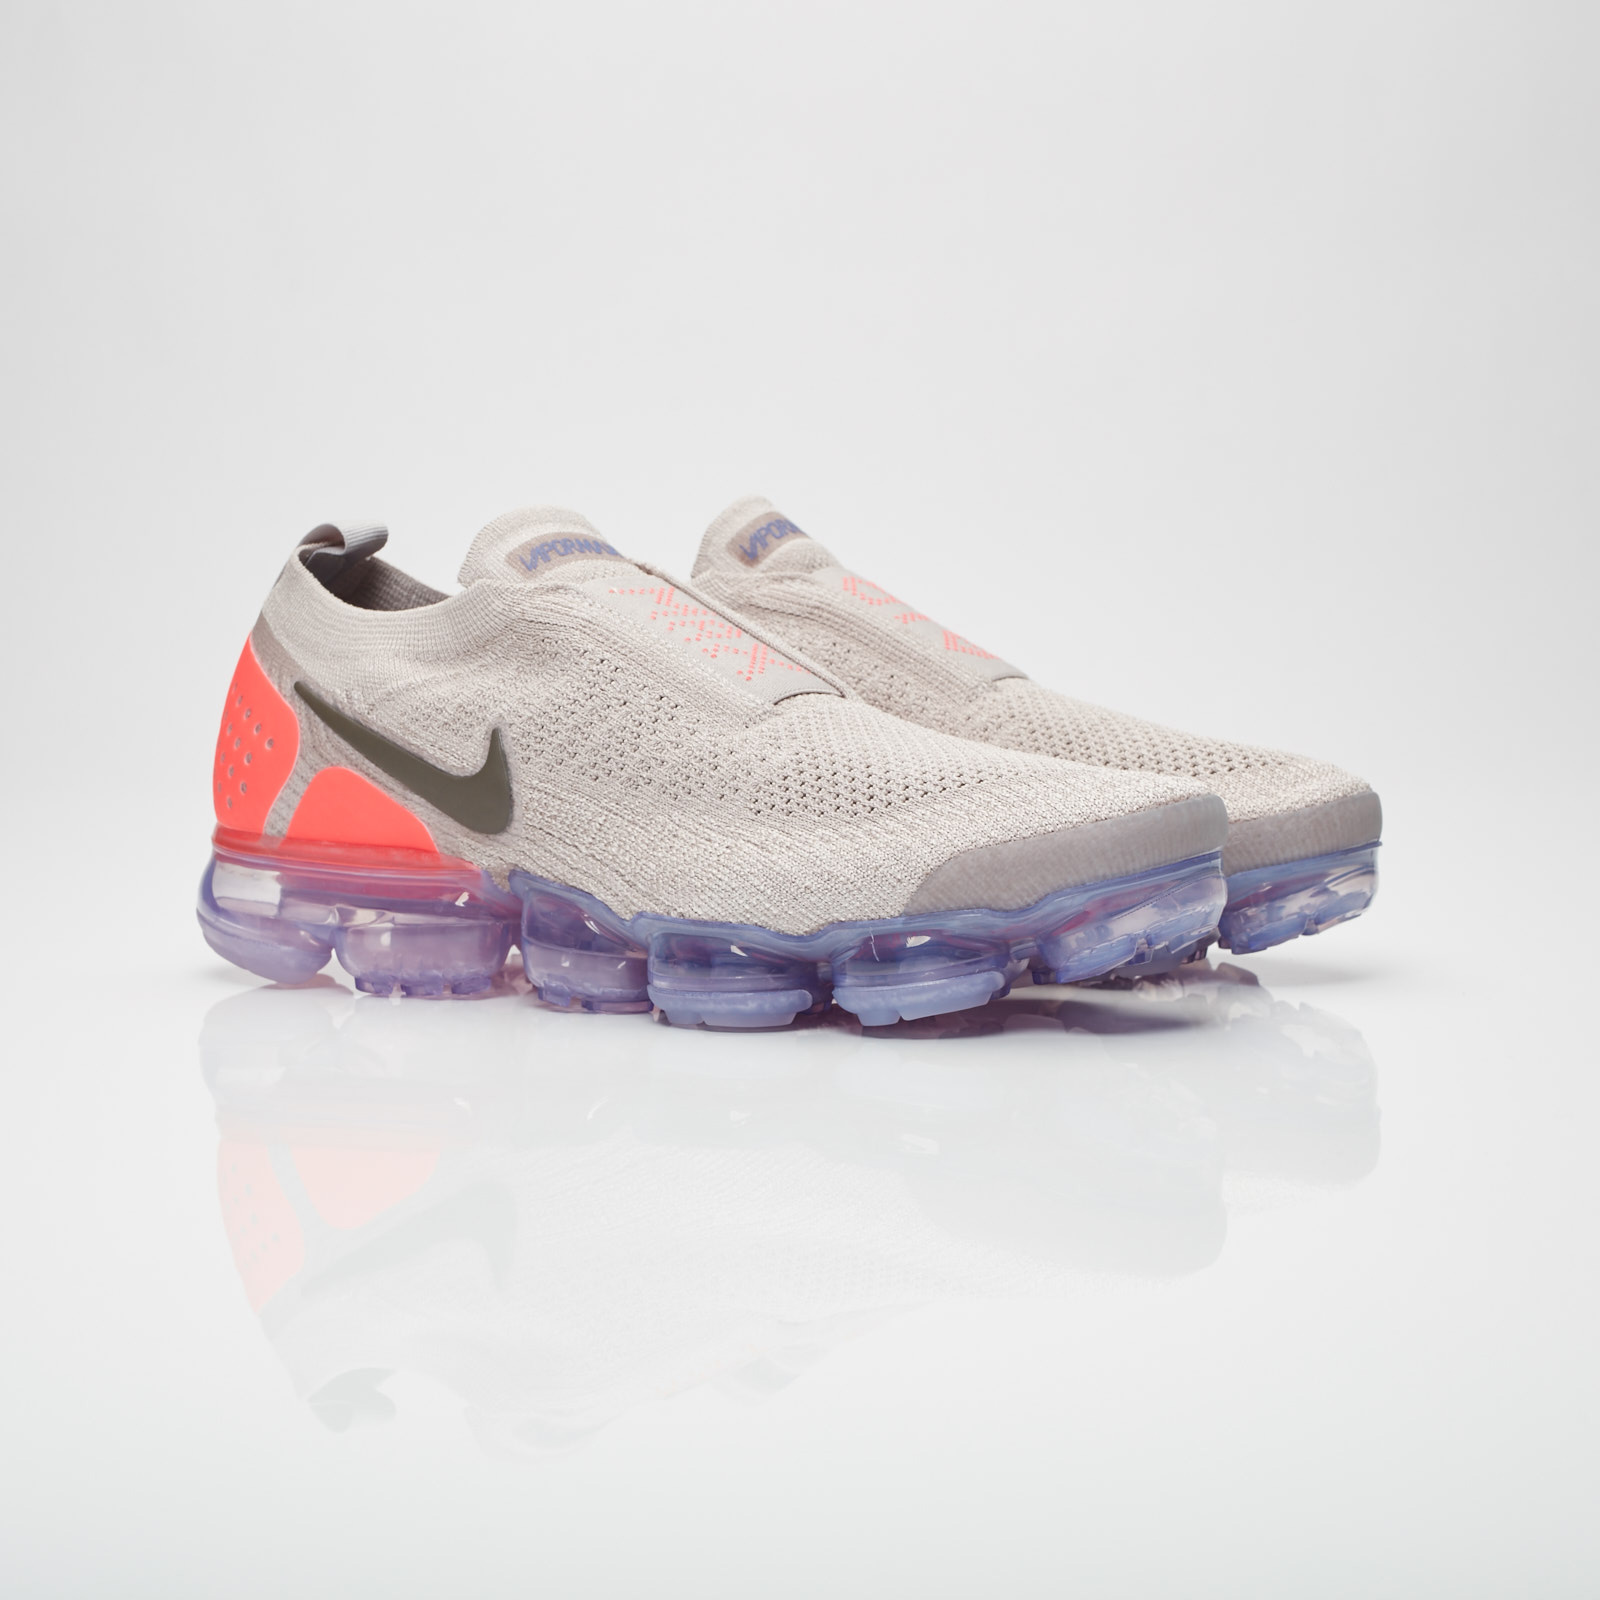 Nike amp; VaporMax FK MOC 2 Sneakers OLbO1dgTce - zmtelekom.com